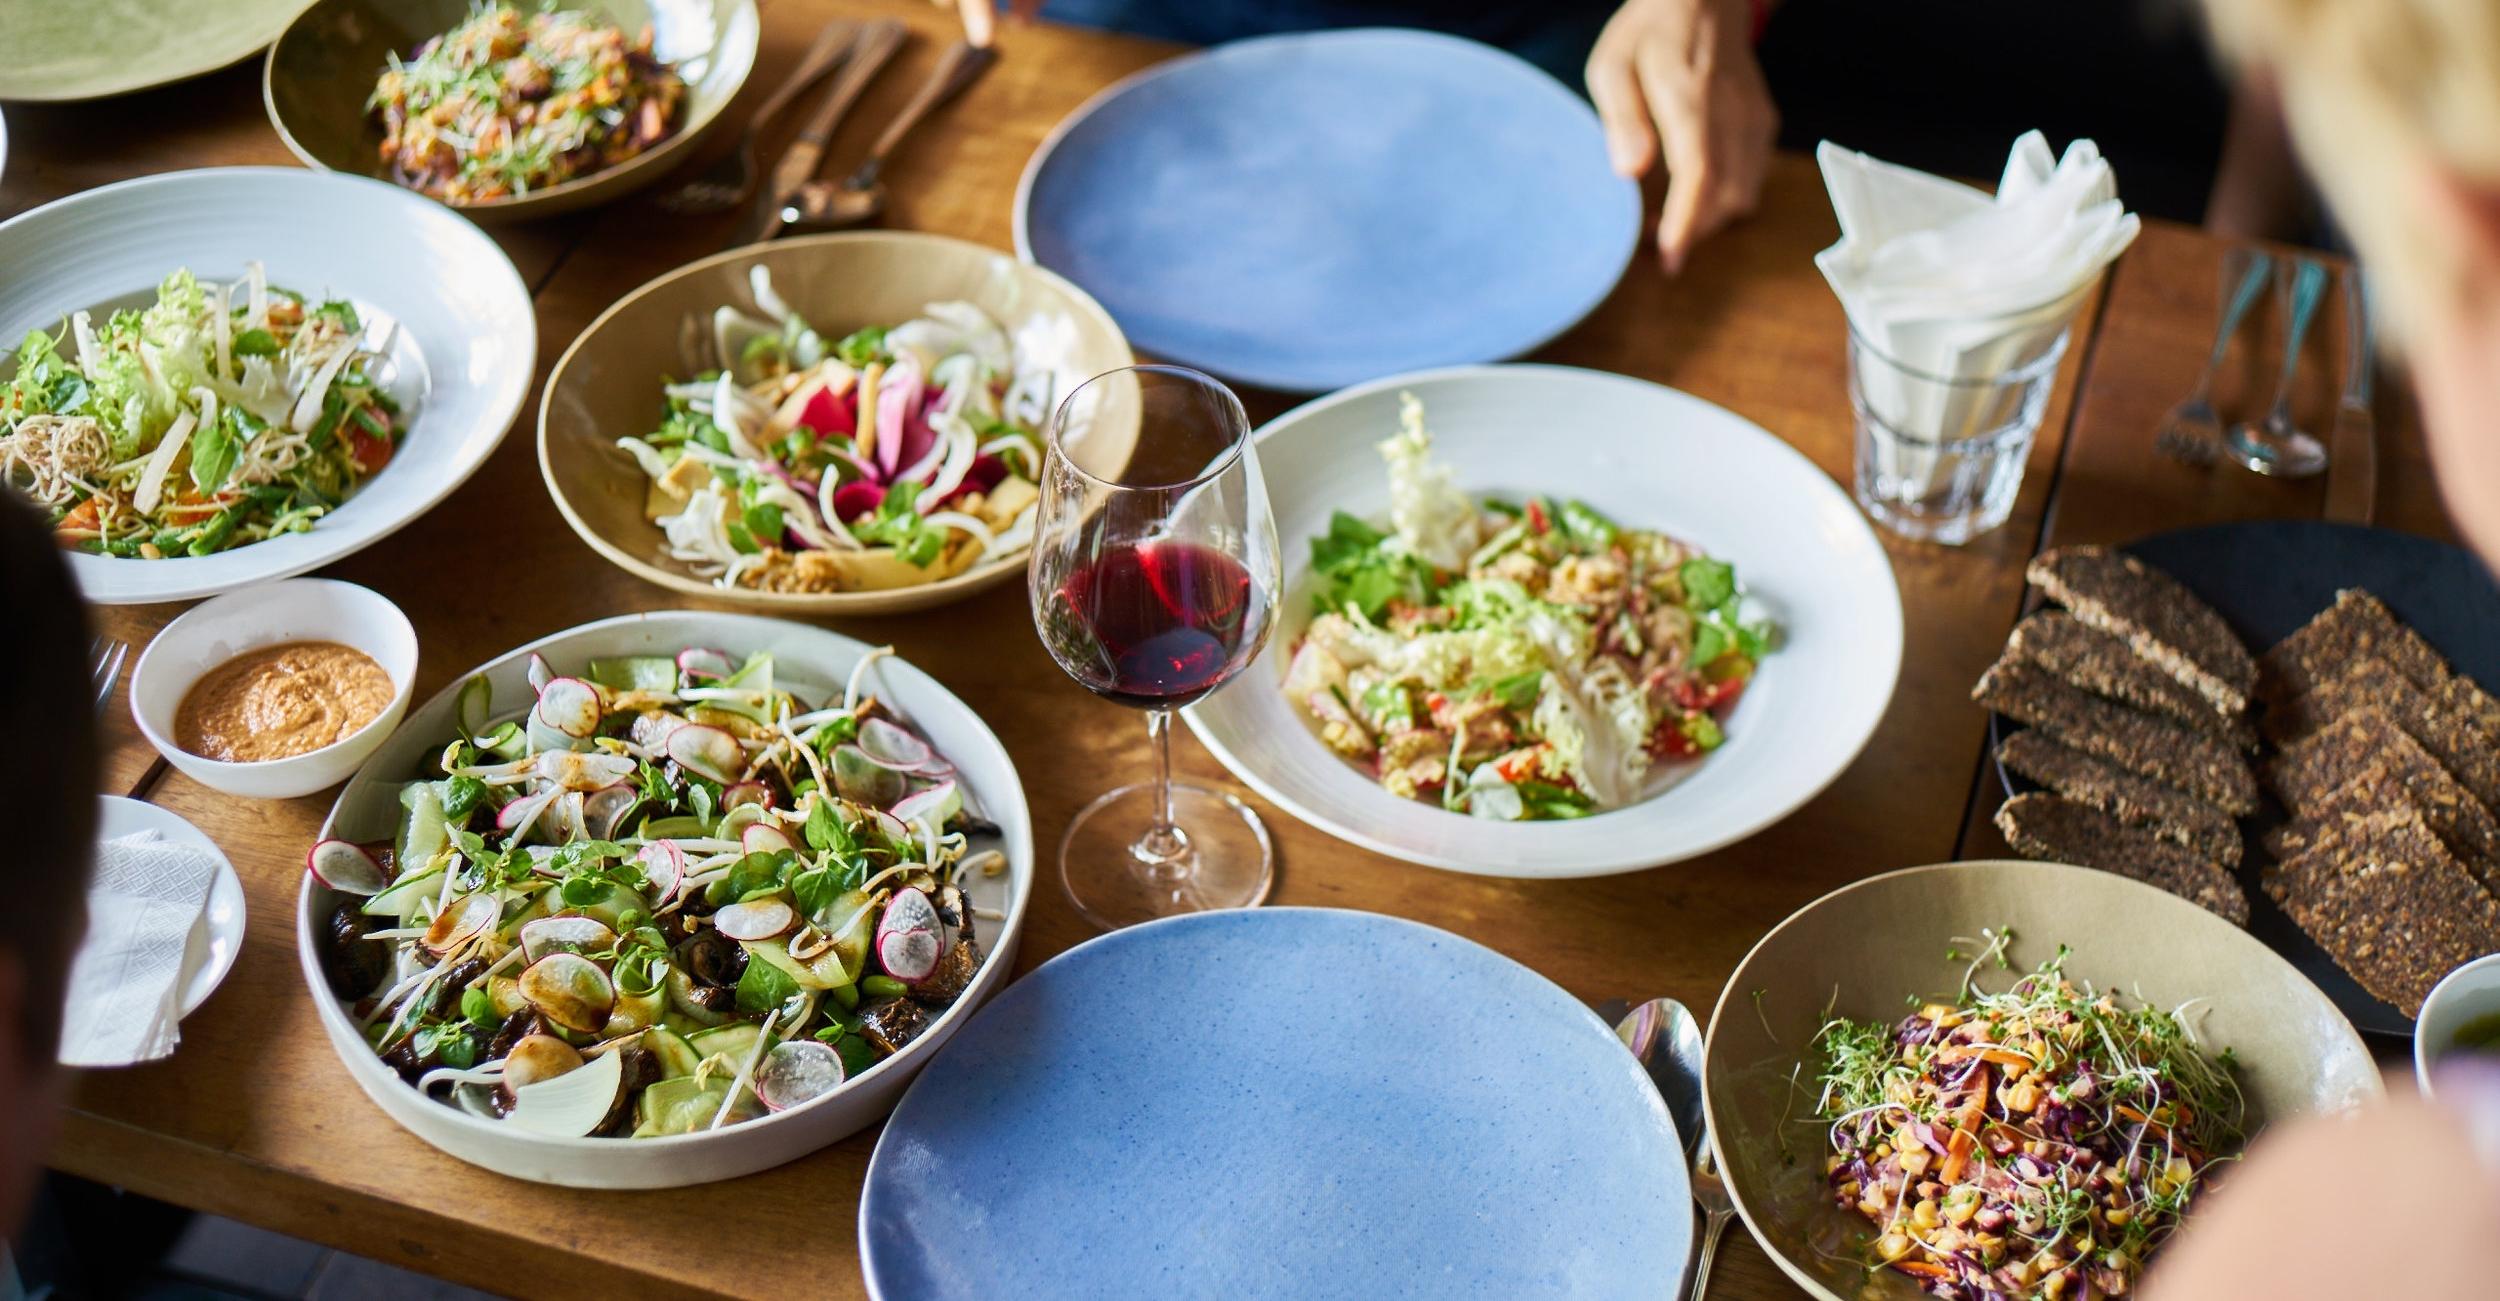 Breakfast Lunch Dinner SNACKS - FREE PLANT-BASED RECIPE GUIDE